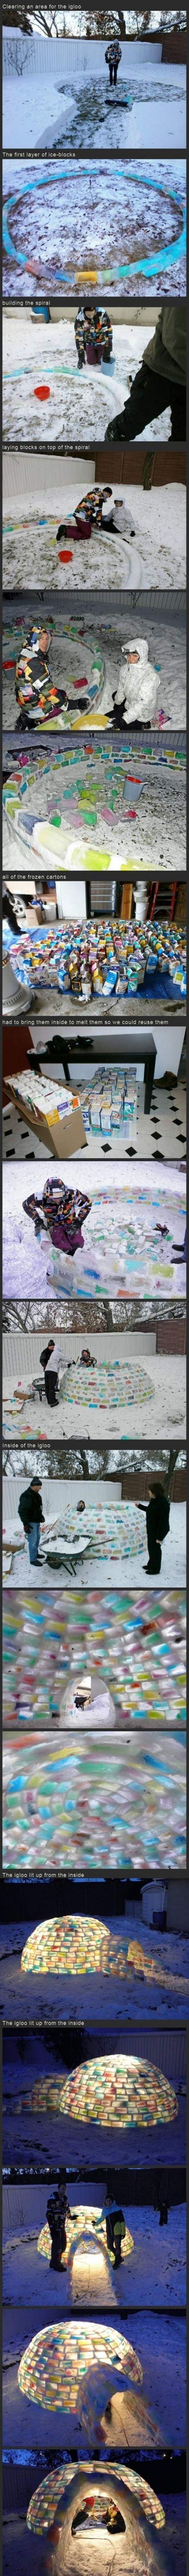 Coolest igloo ever